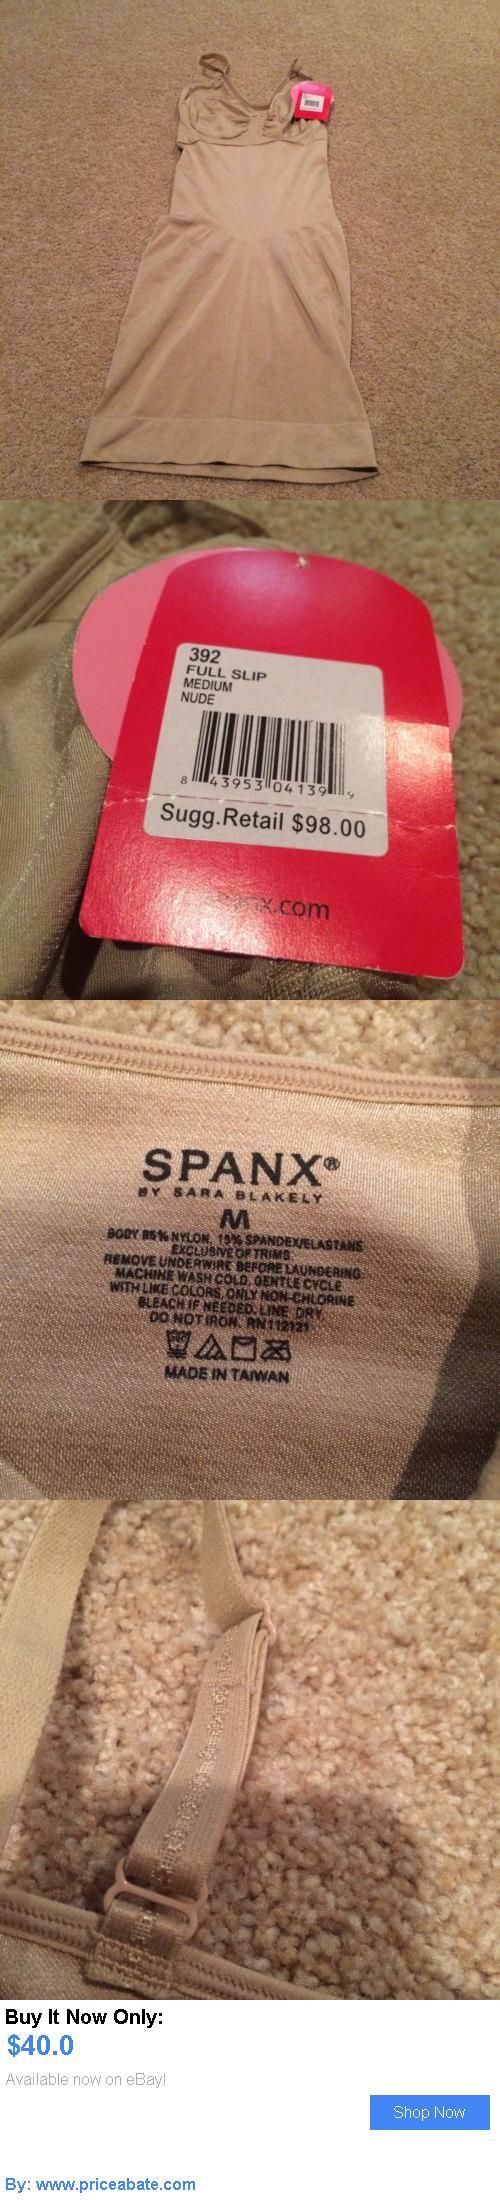 Women Shapewear: Womens Spanx Full Slip Sz M Nude Nwt Great Item!!! BUY IT NOW ONLY: $40.0 #priceabateWomenShapewear OR #priceabate